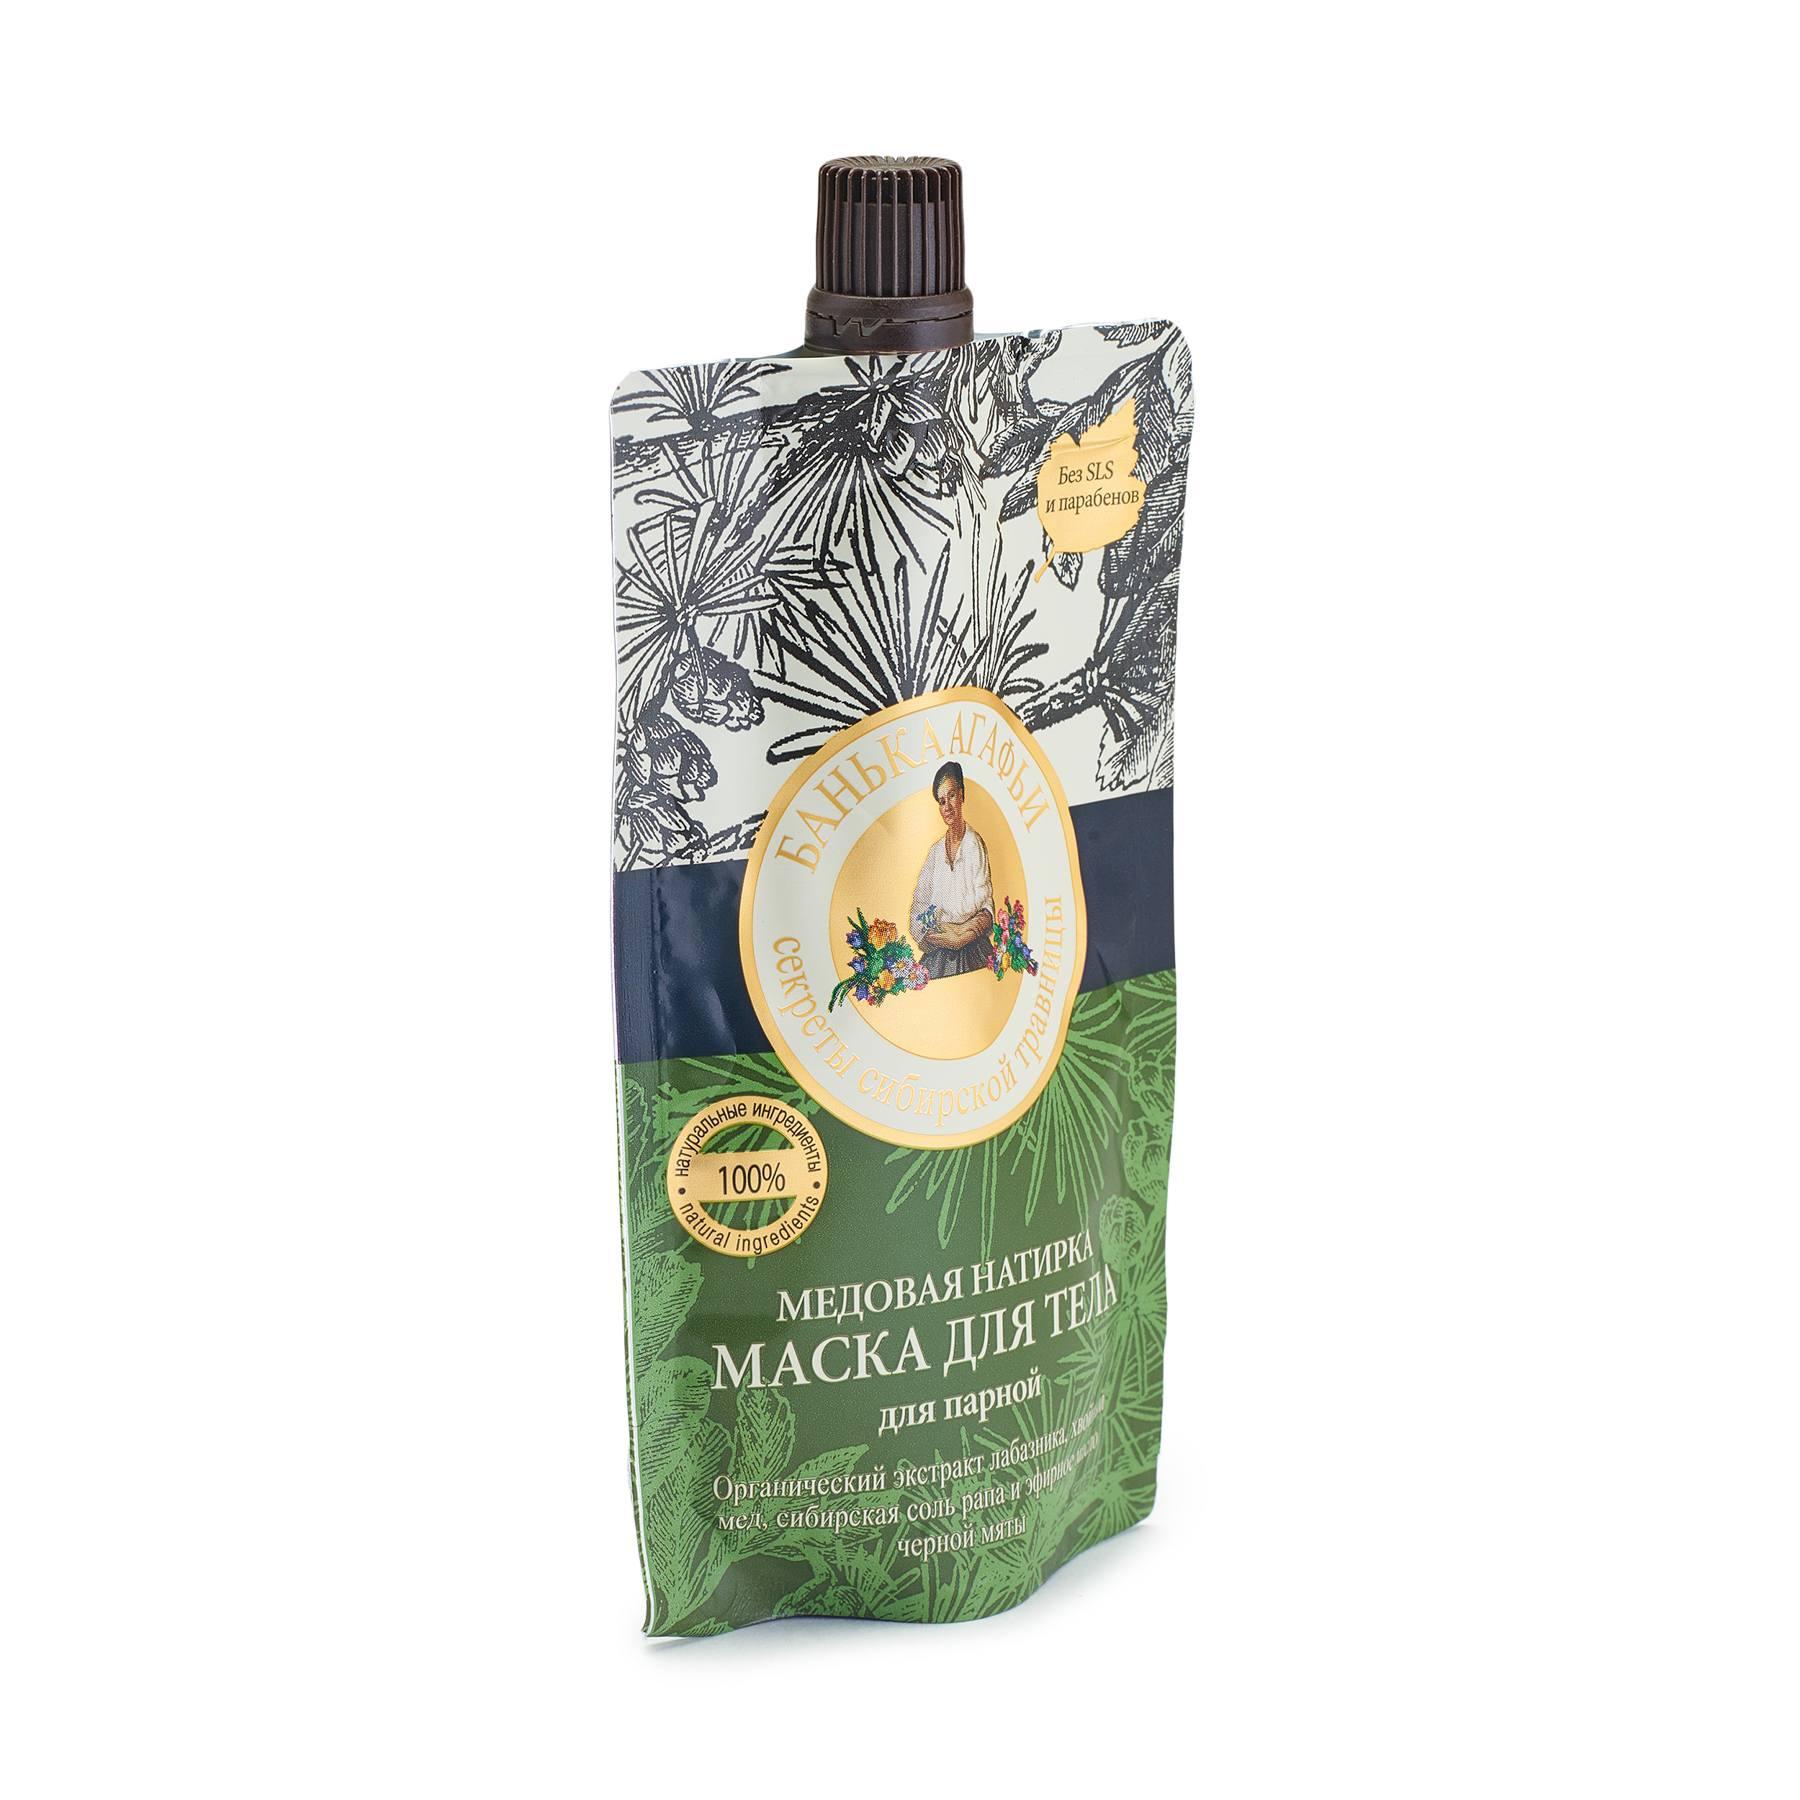 Купить Банька Агафьи Маска для тела Медовая натирка , , 100 мл, РЕЦЕПТЫ БАБУШКИ АГАФЬИ (shop: Organic-shops Organic shops)